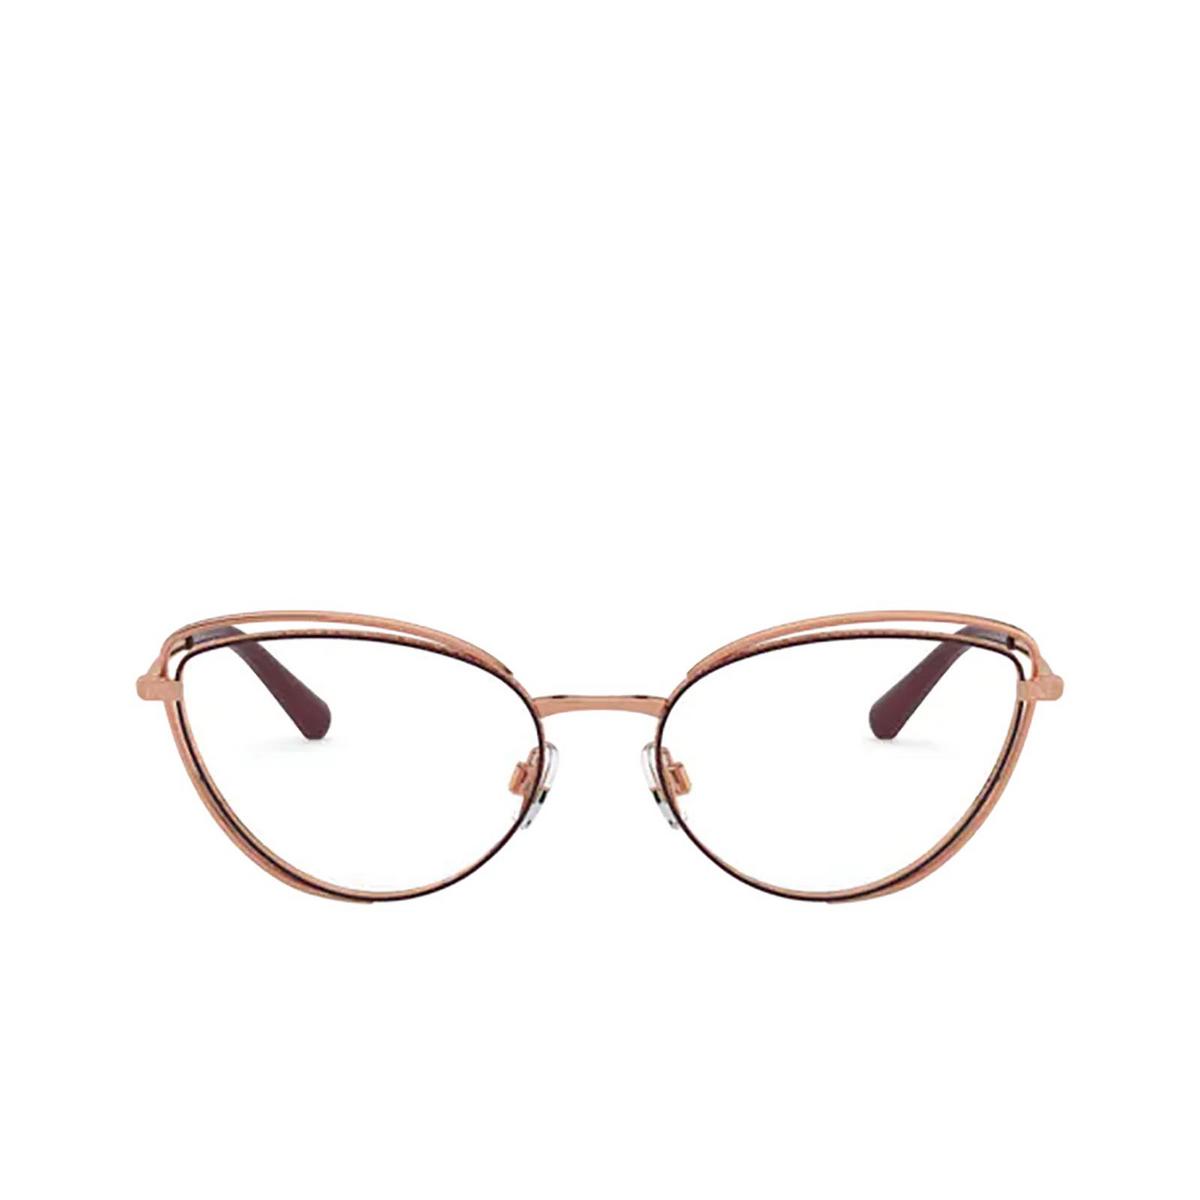 Dolce & Gabbana® Cat-eye Eyeglasses: DG1326 color Pink Gold / Bordeaux 1333 - front view.